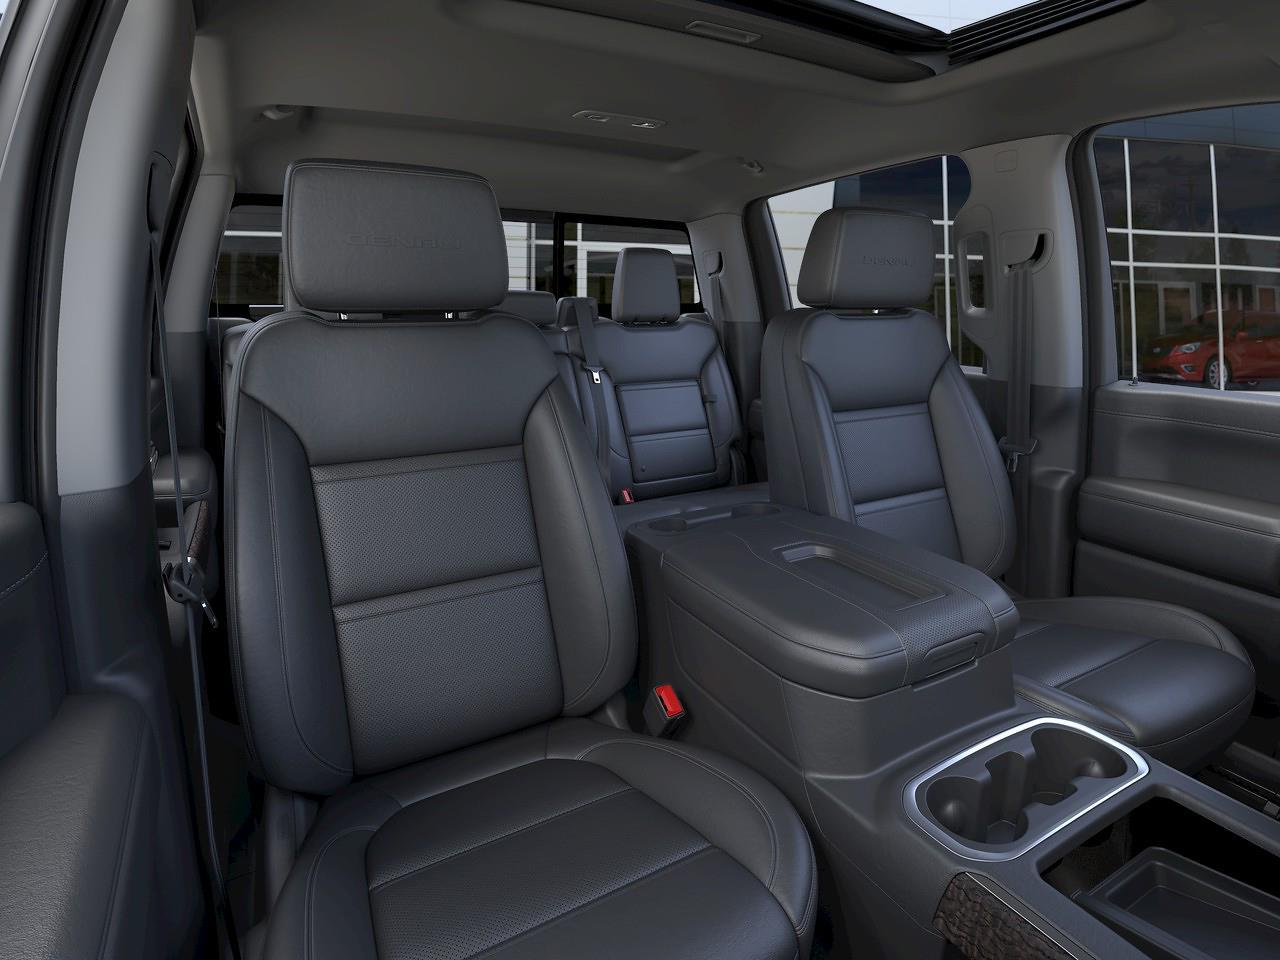 2021 GMC Sierra 3500 Crew Cab 4x4, Pickup #GM12116 - photo 13